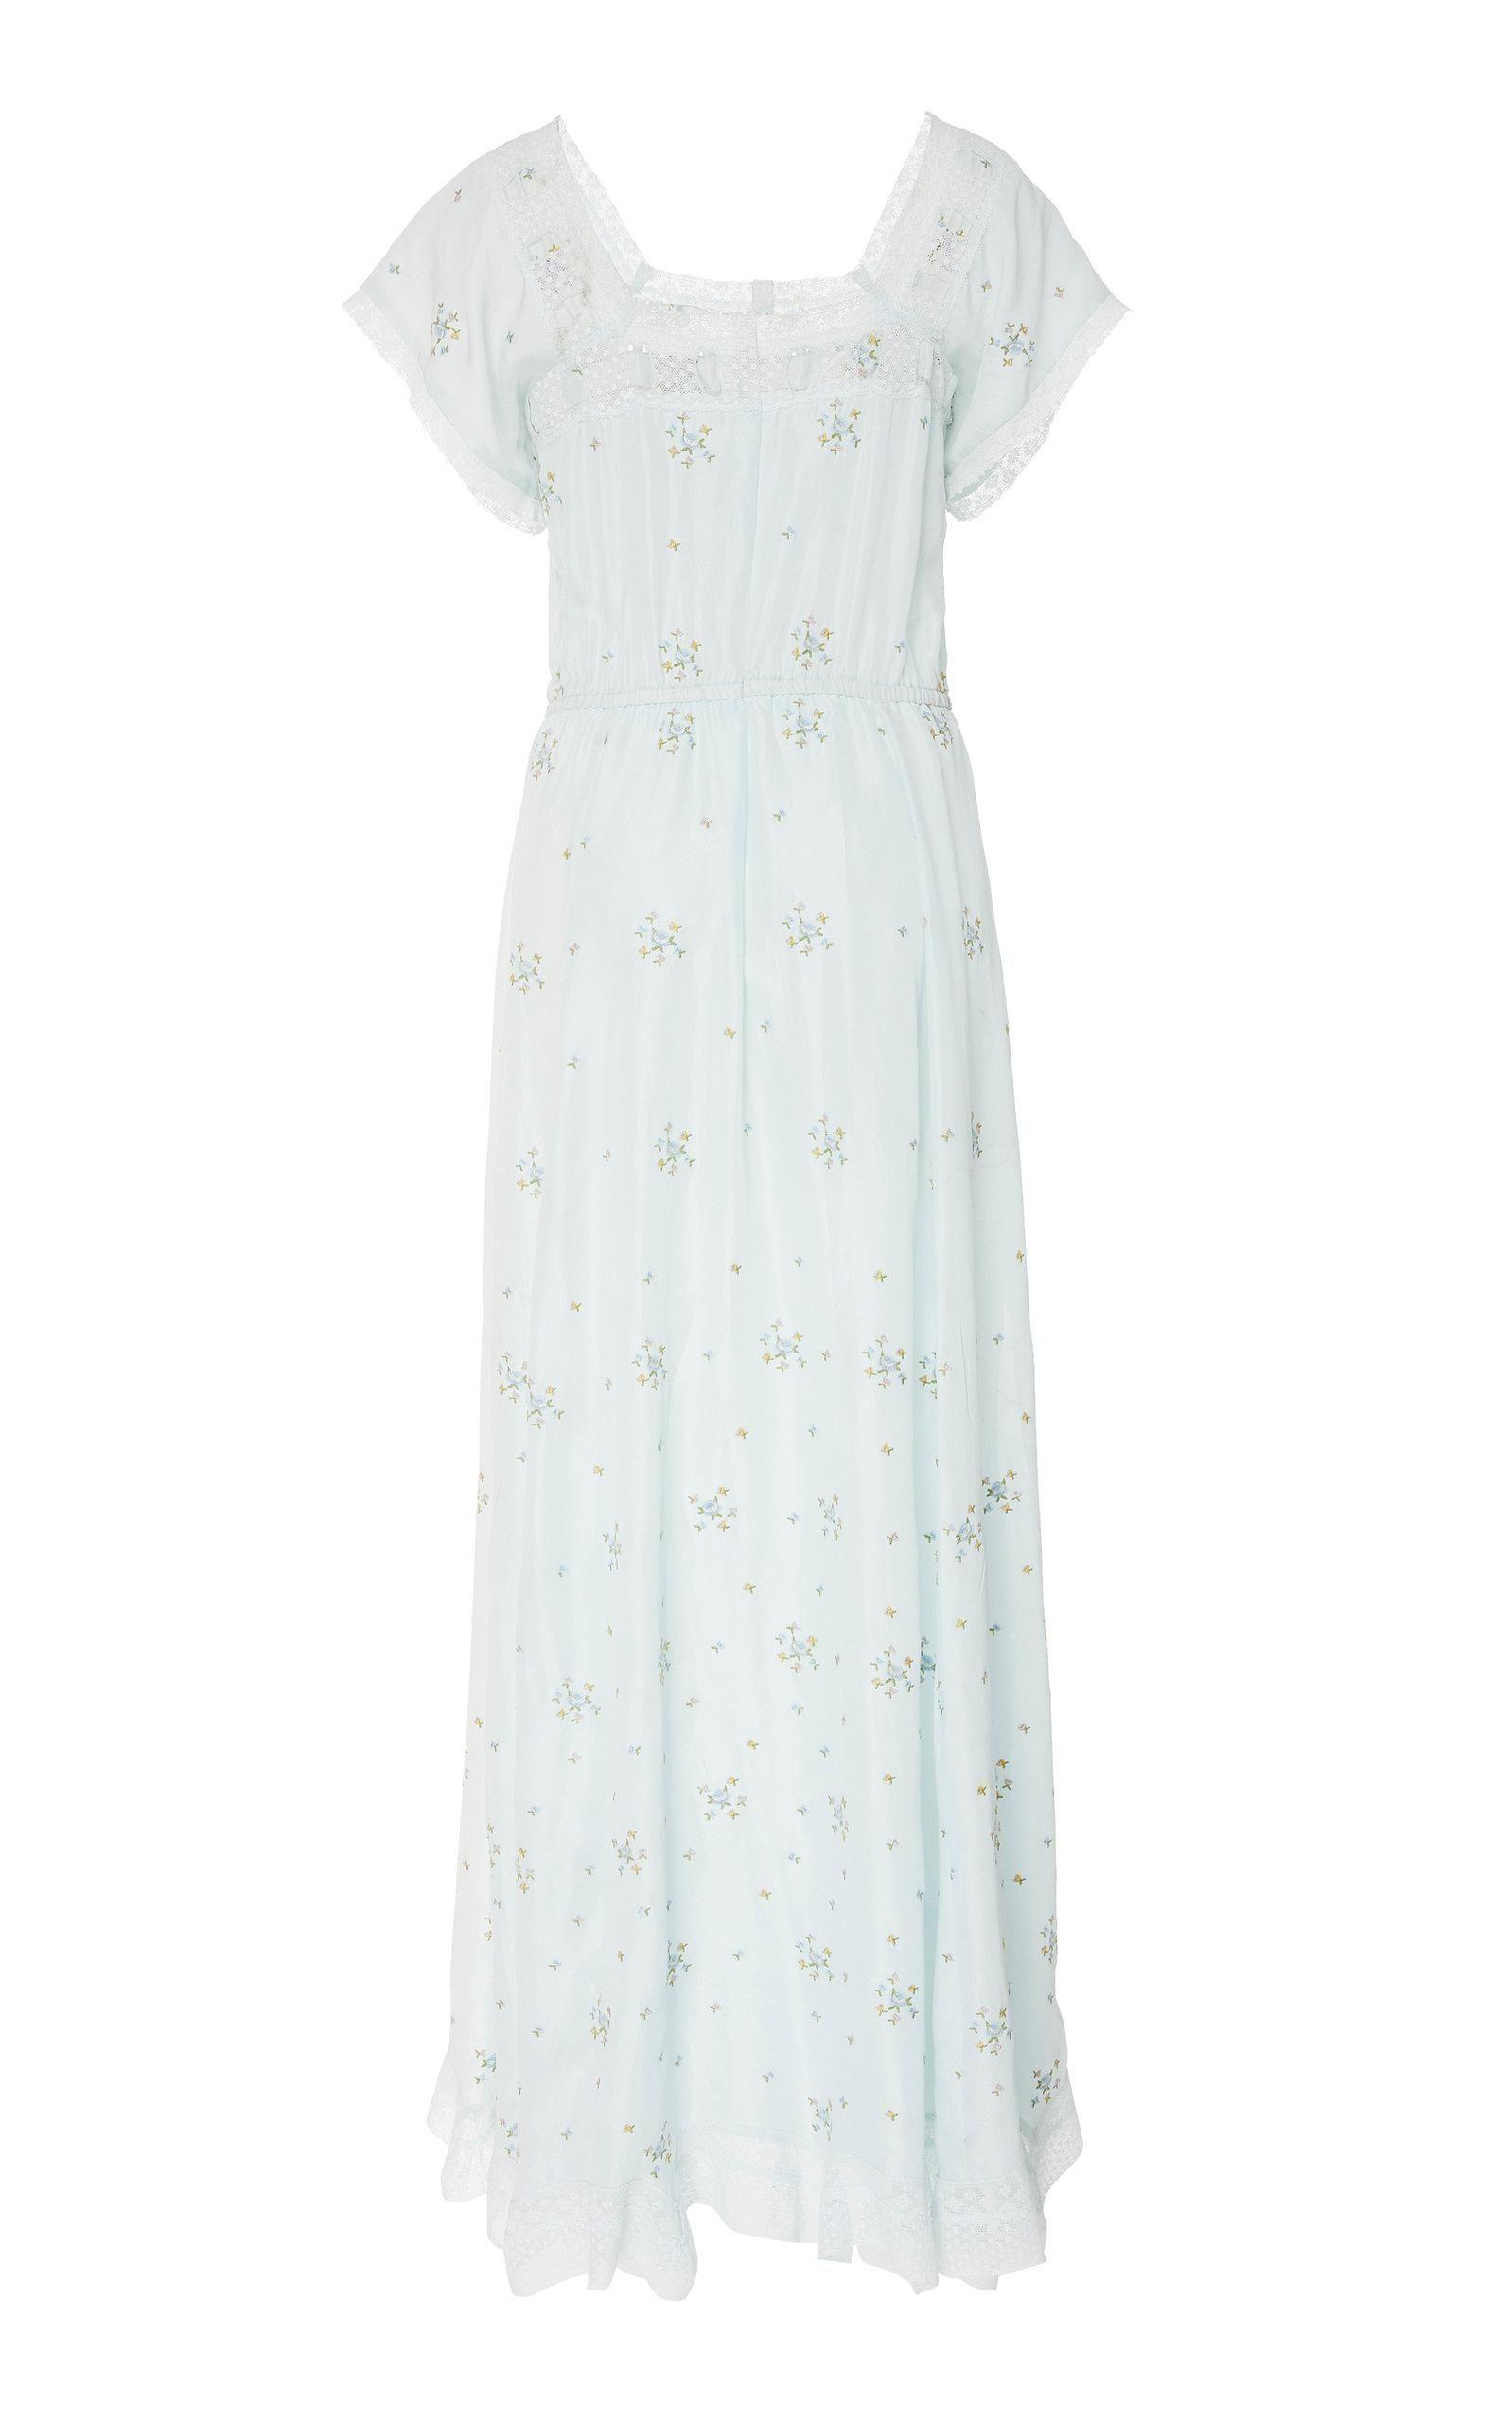 Pin by Mary Lamb on Style. | Silk maxi dress, Dresses, Fashion